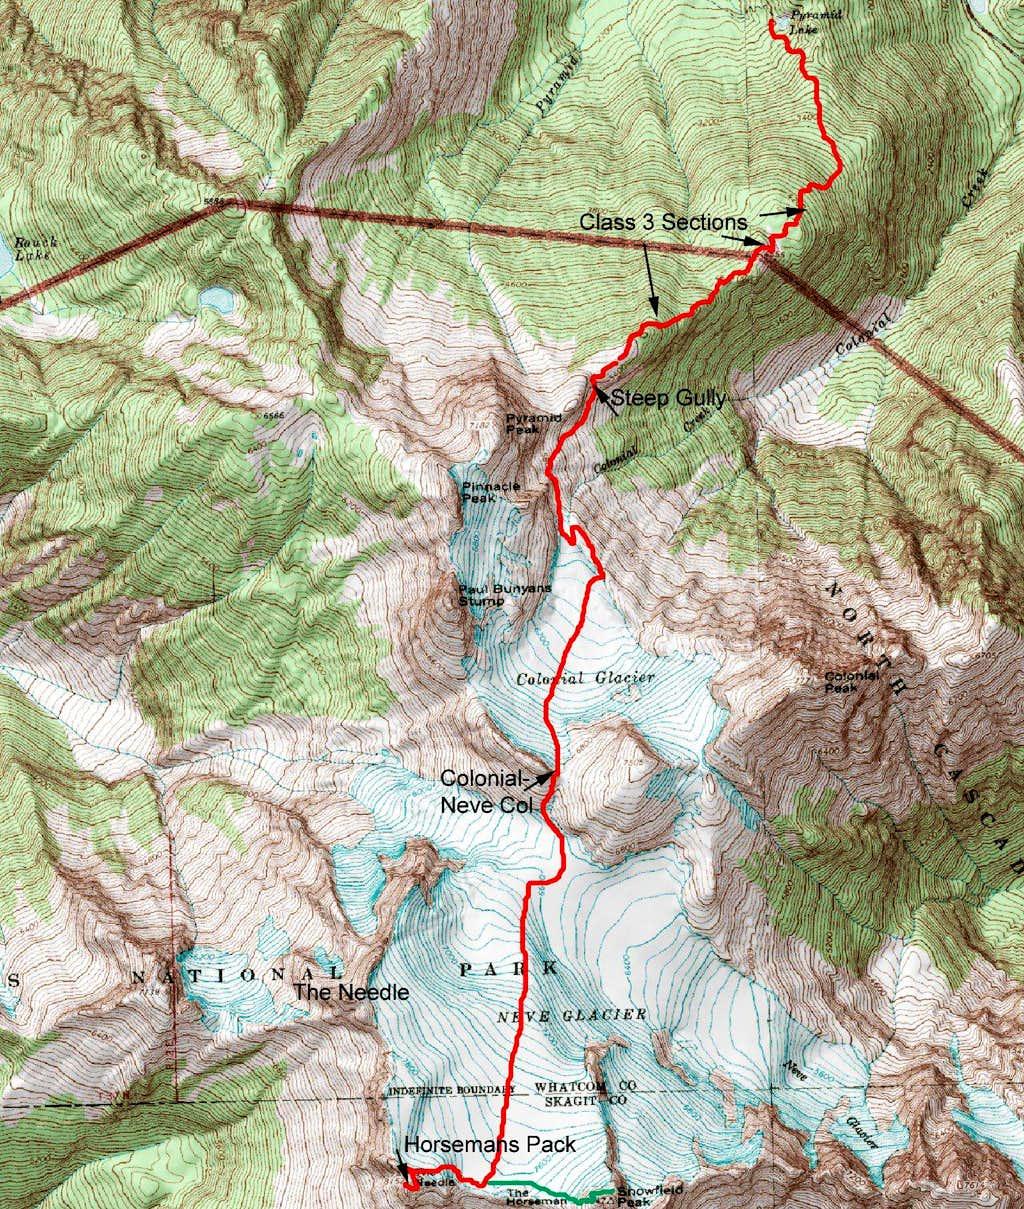 Horsemans Pack Route